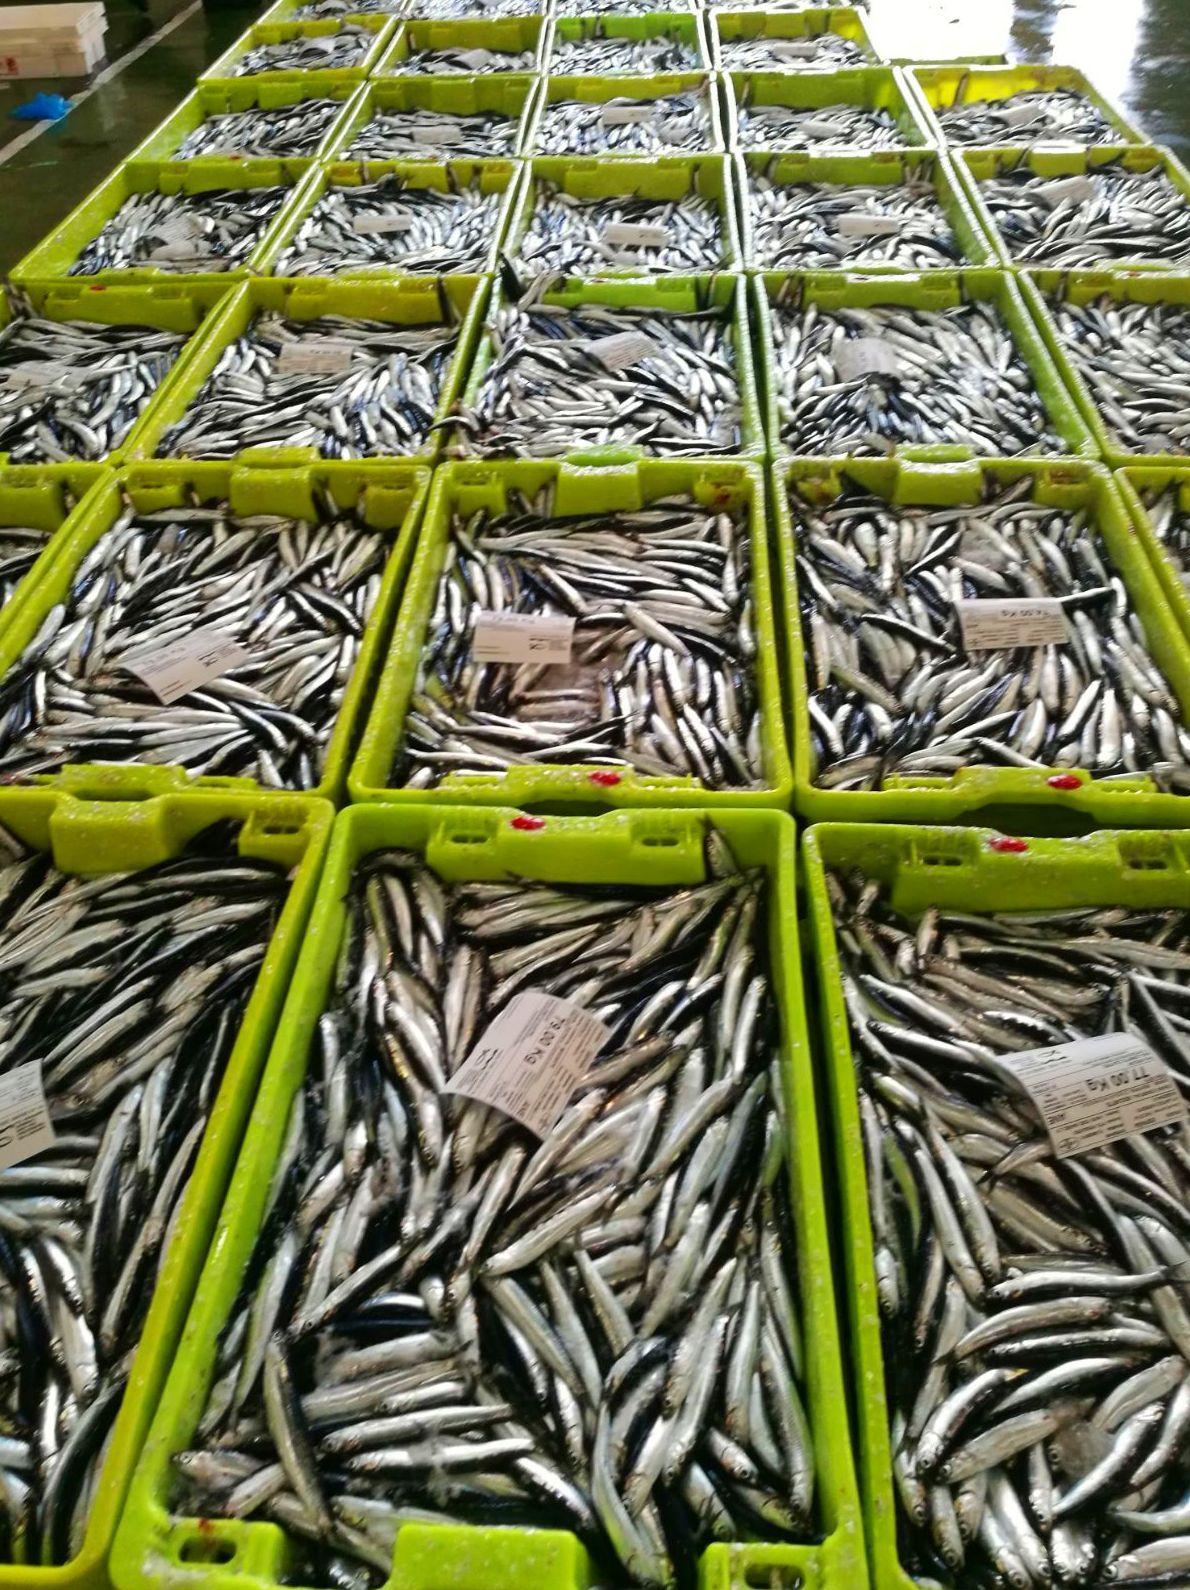 Bocartes: SERVICIOS de Pescastur